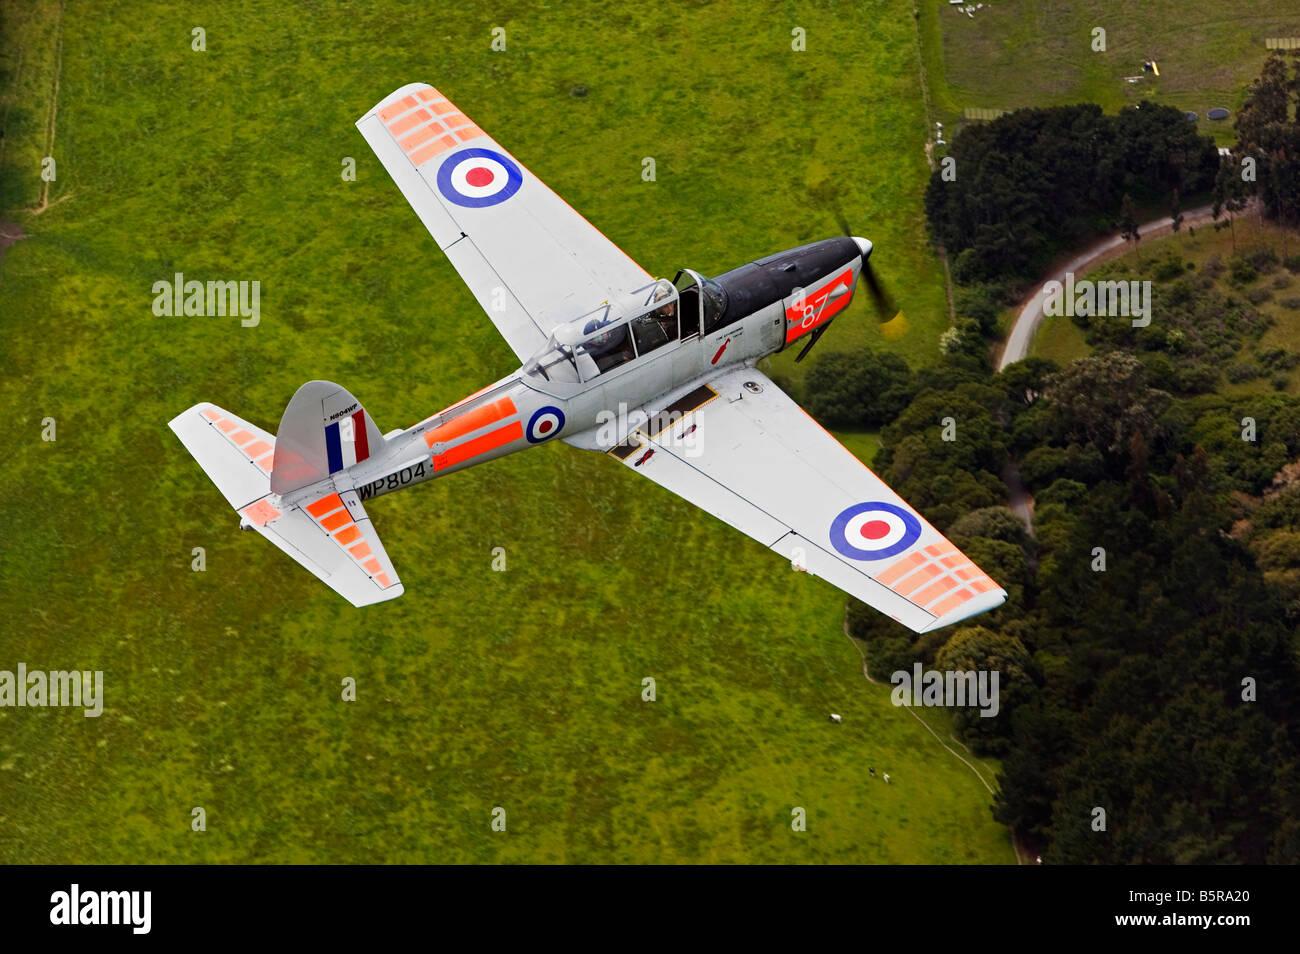 aerial view above de Havilland aircraft Chipmunk DH10 - Stock Image